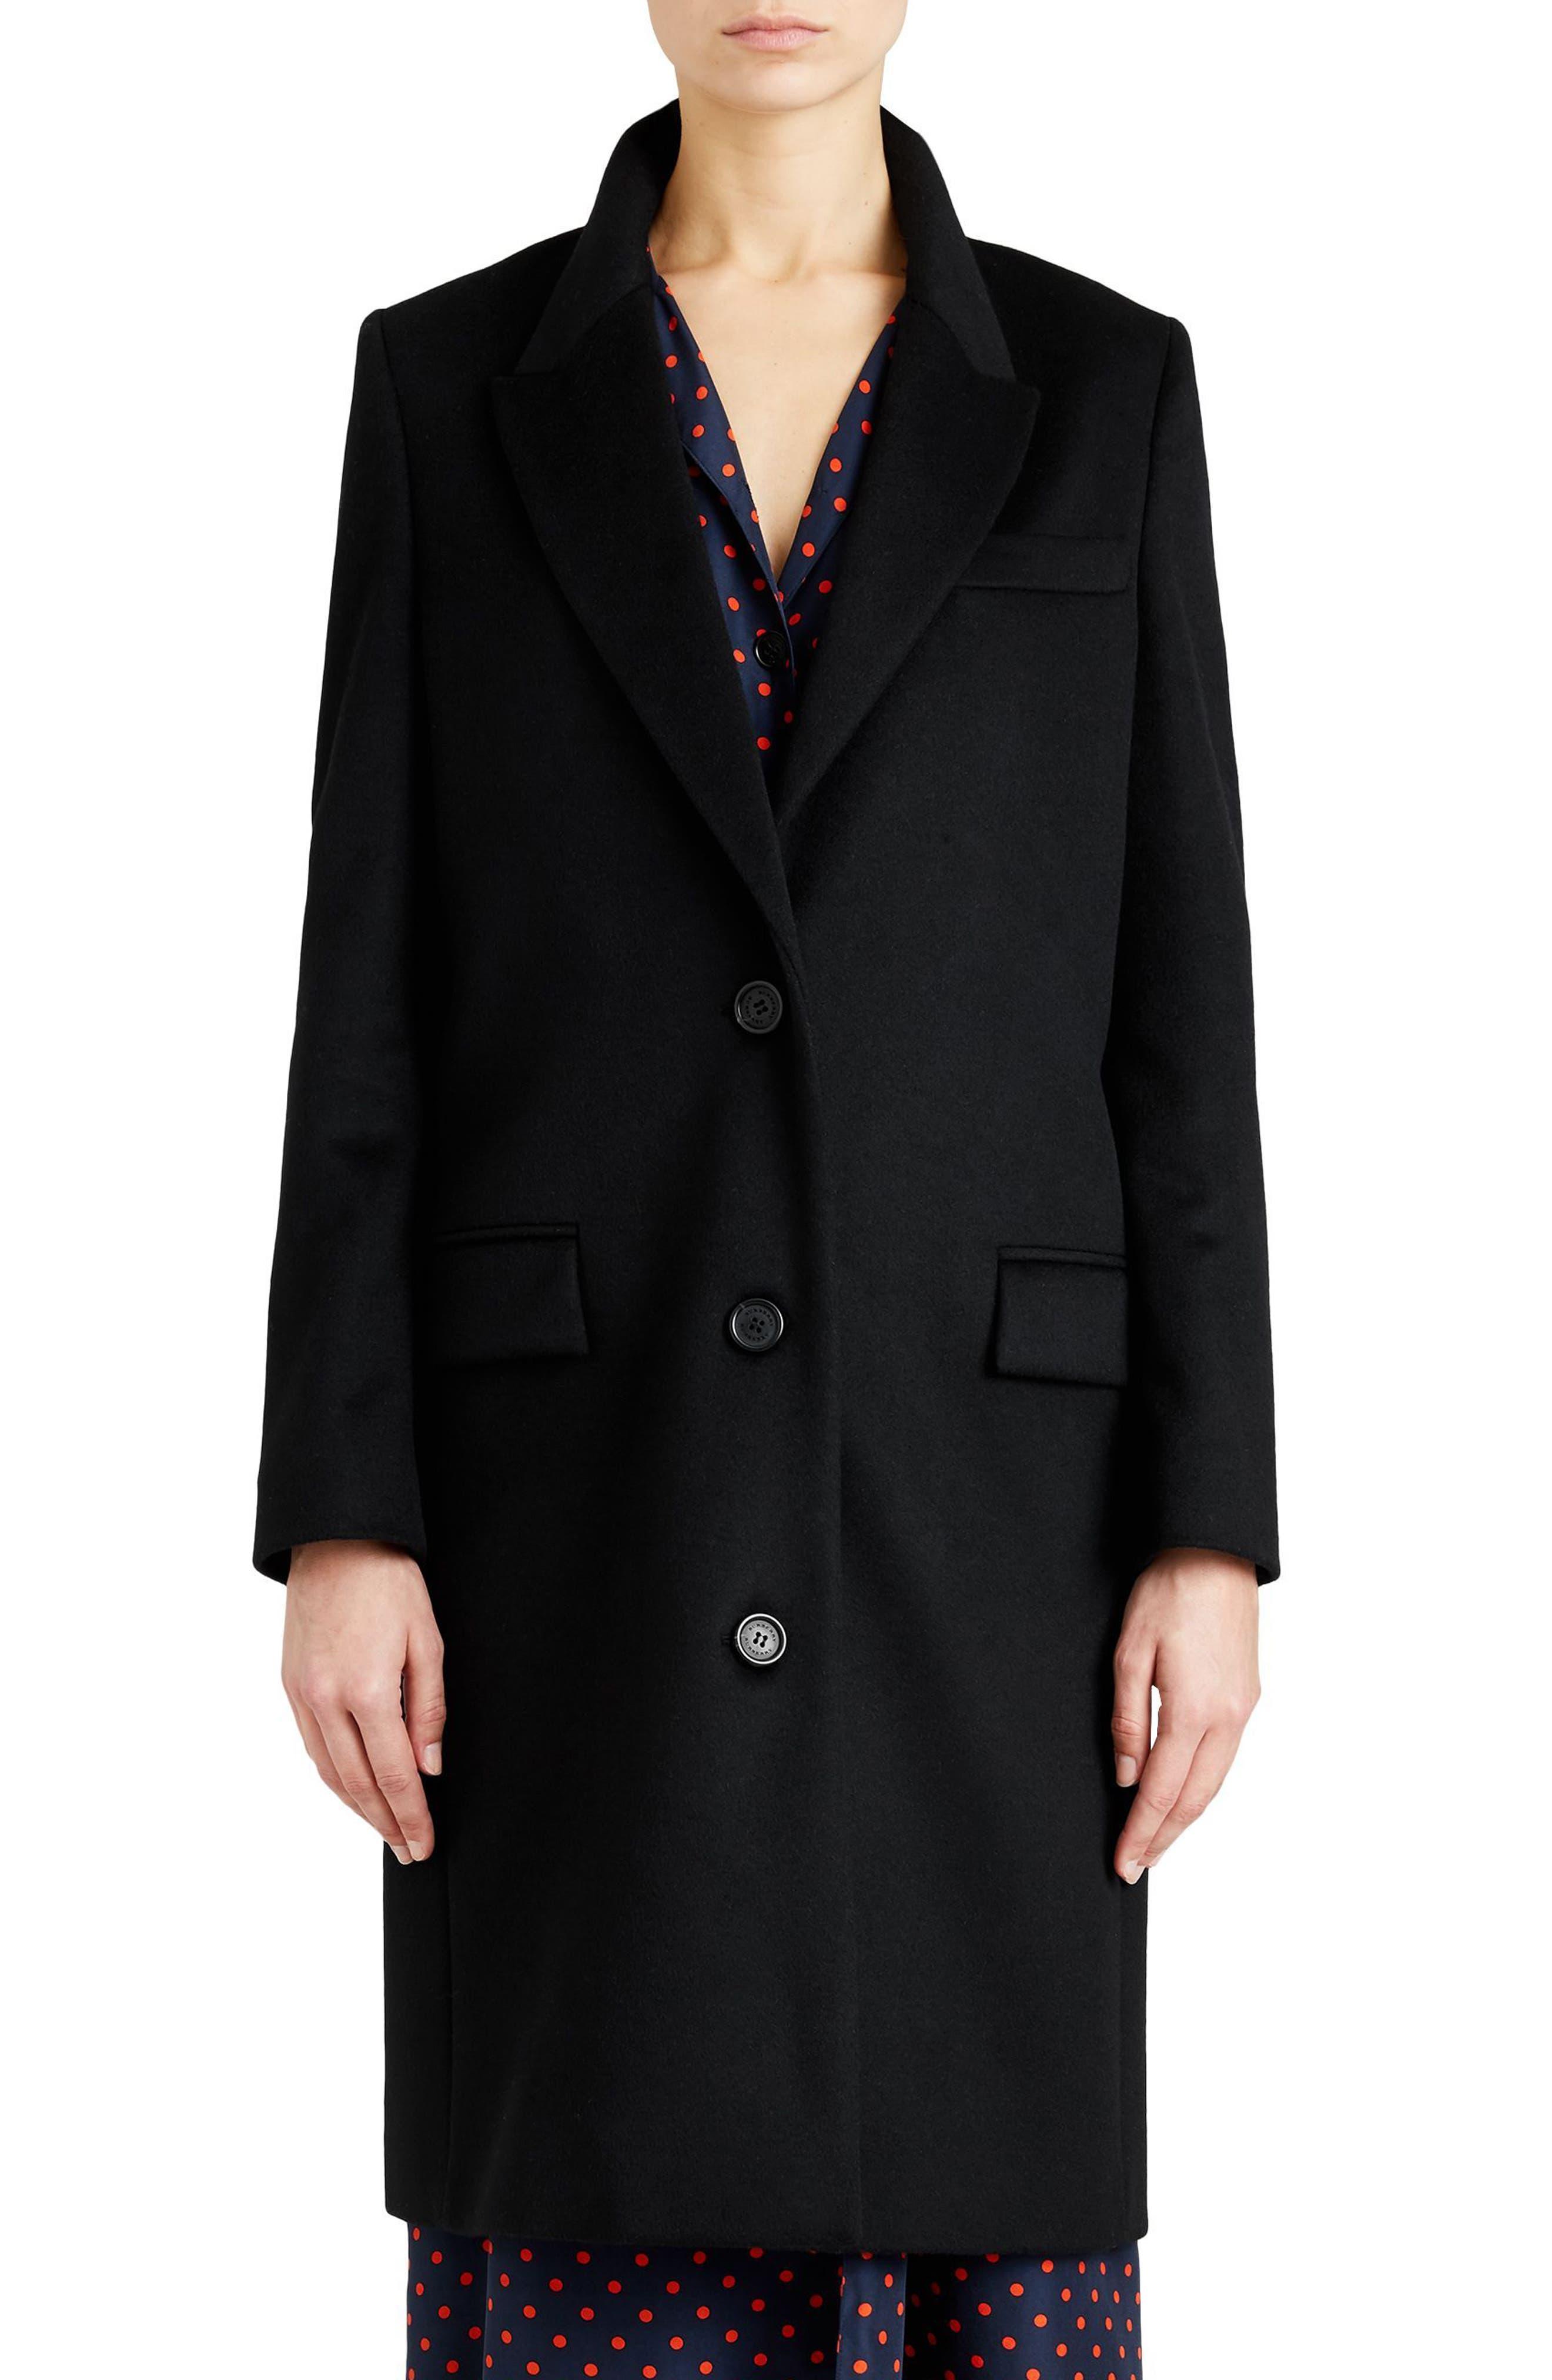 Fellhurst Wool & Cashmere Coat,                             Main thumbnail 1, color,                             001